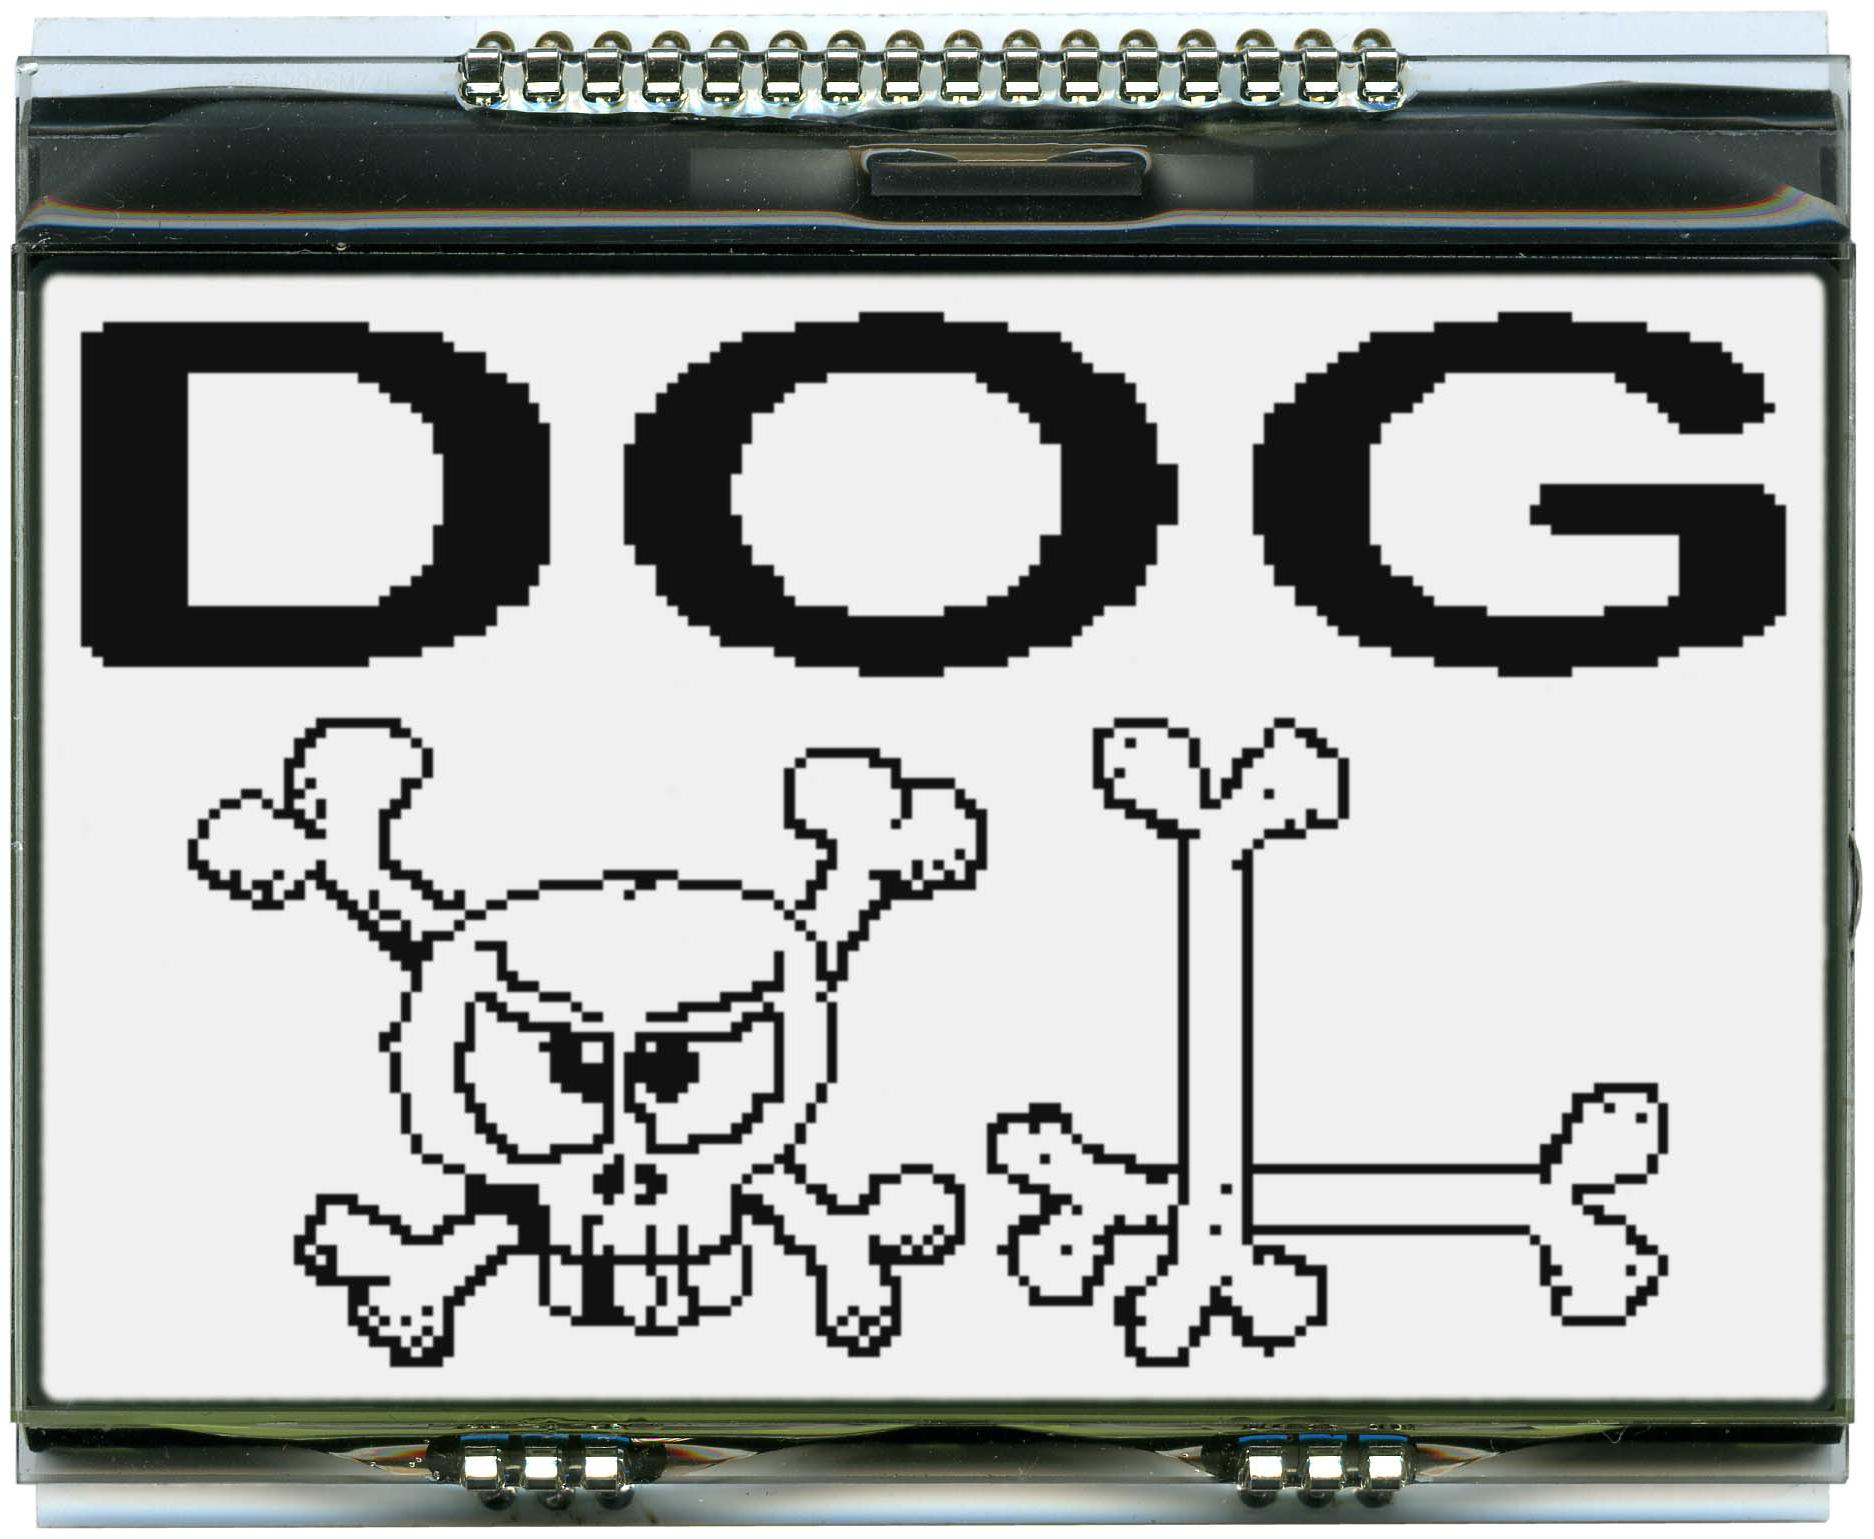 160x104 DOG Grafikdisplay, FSTN weiss